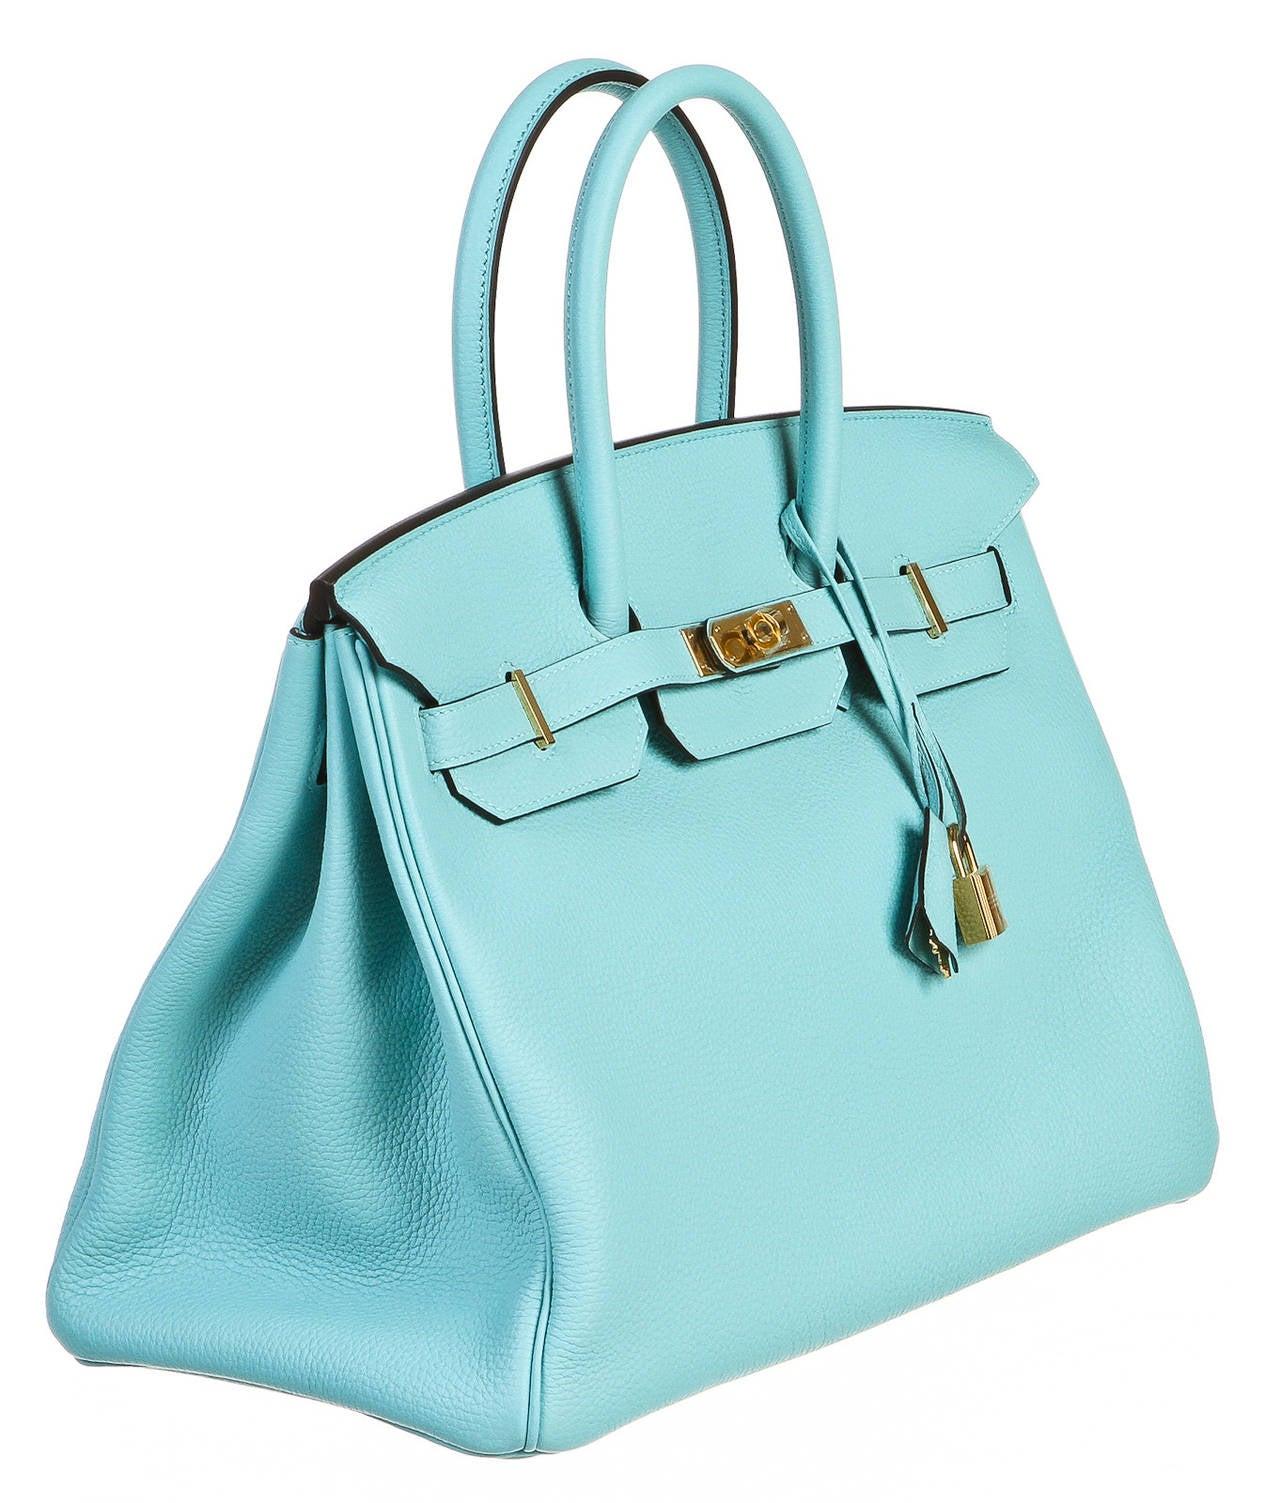 Hermes Blue Atoll 35cm Togo Leather Birkin Handbag GHW at 1stdibs